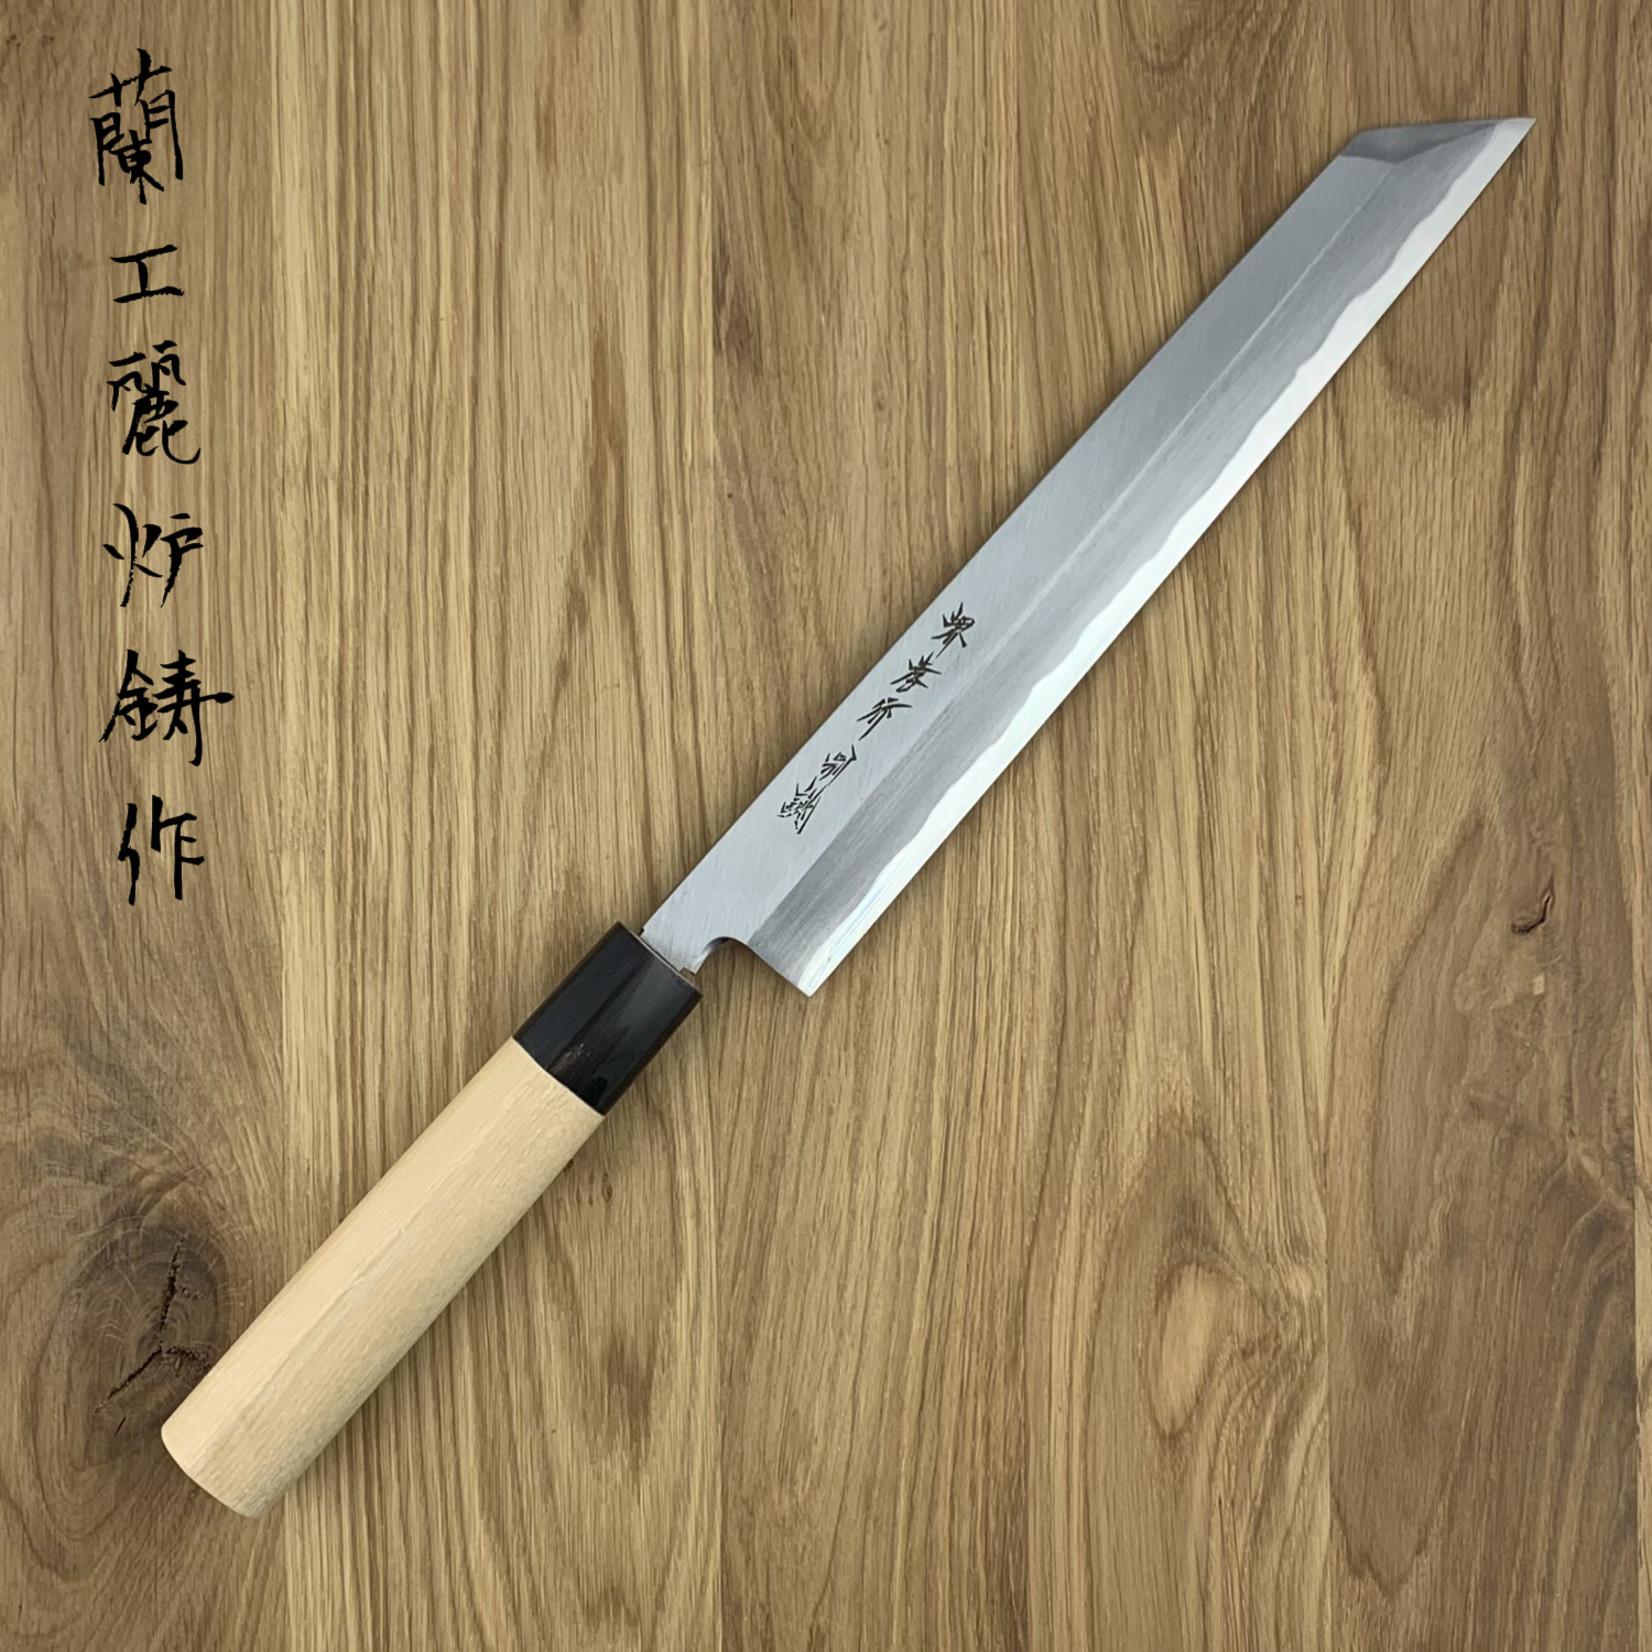 SAKAI TAKAYUKI Tokujou White #2 Magnolia Heft Kiritsuke 240 mm 03153